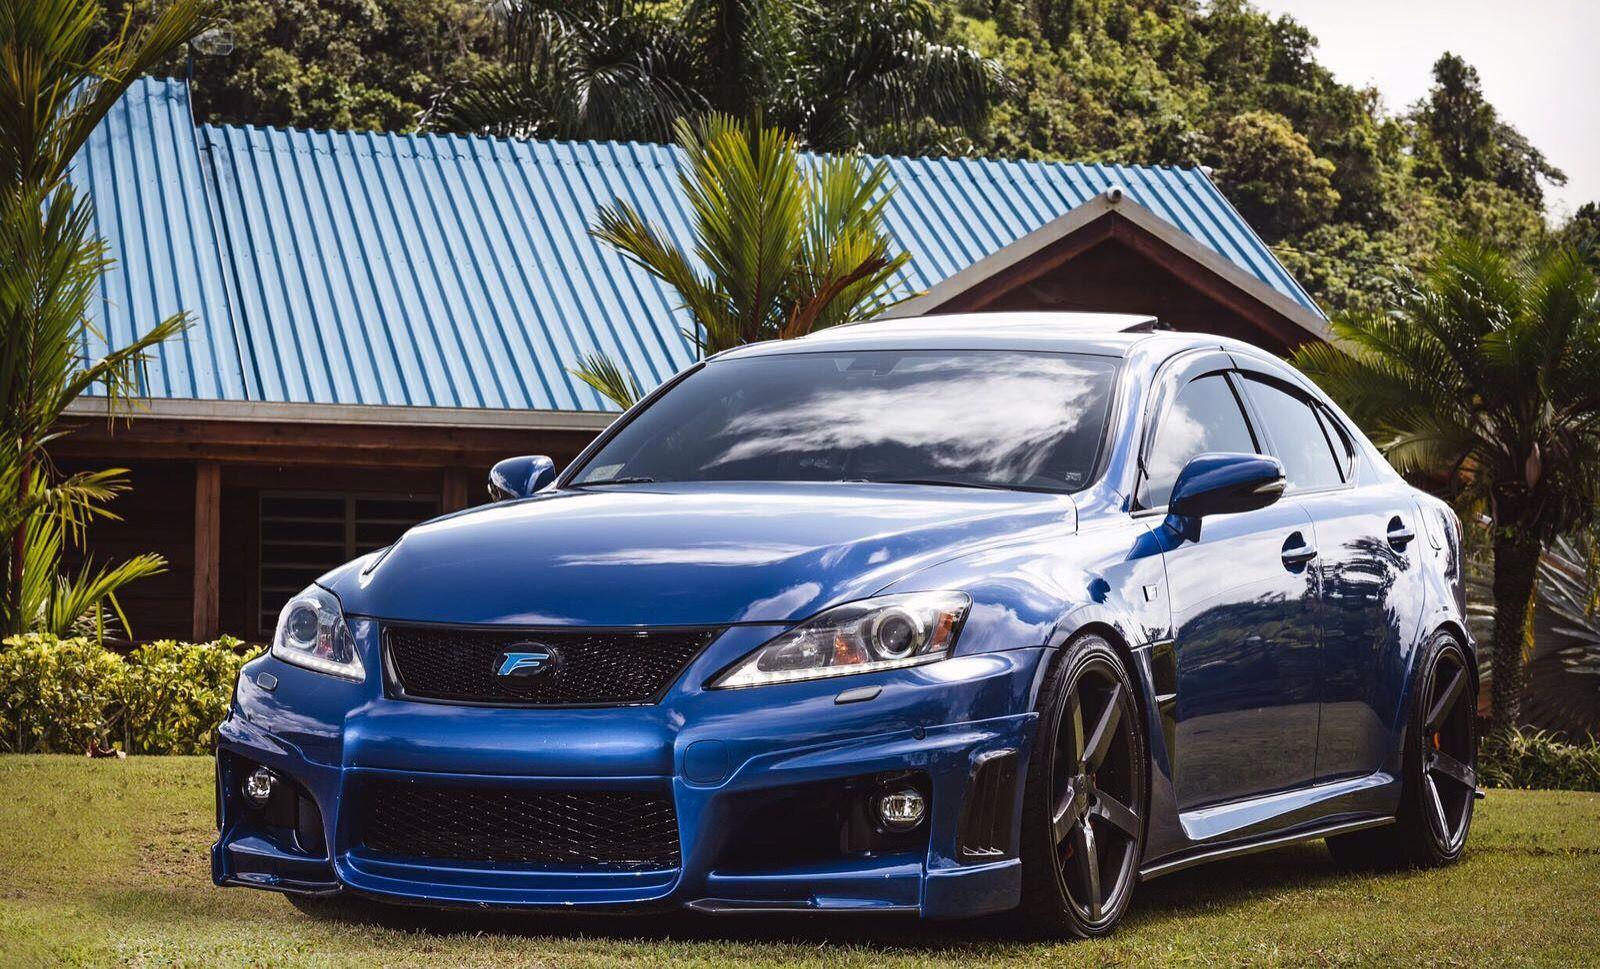 Lexus IsF blue ultrasonic with Vossen cv3r, carbon fender duct